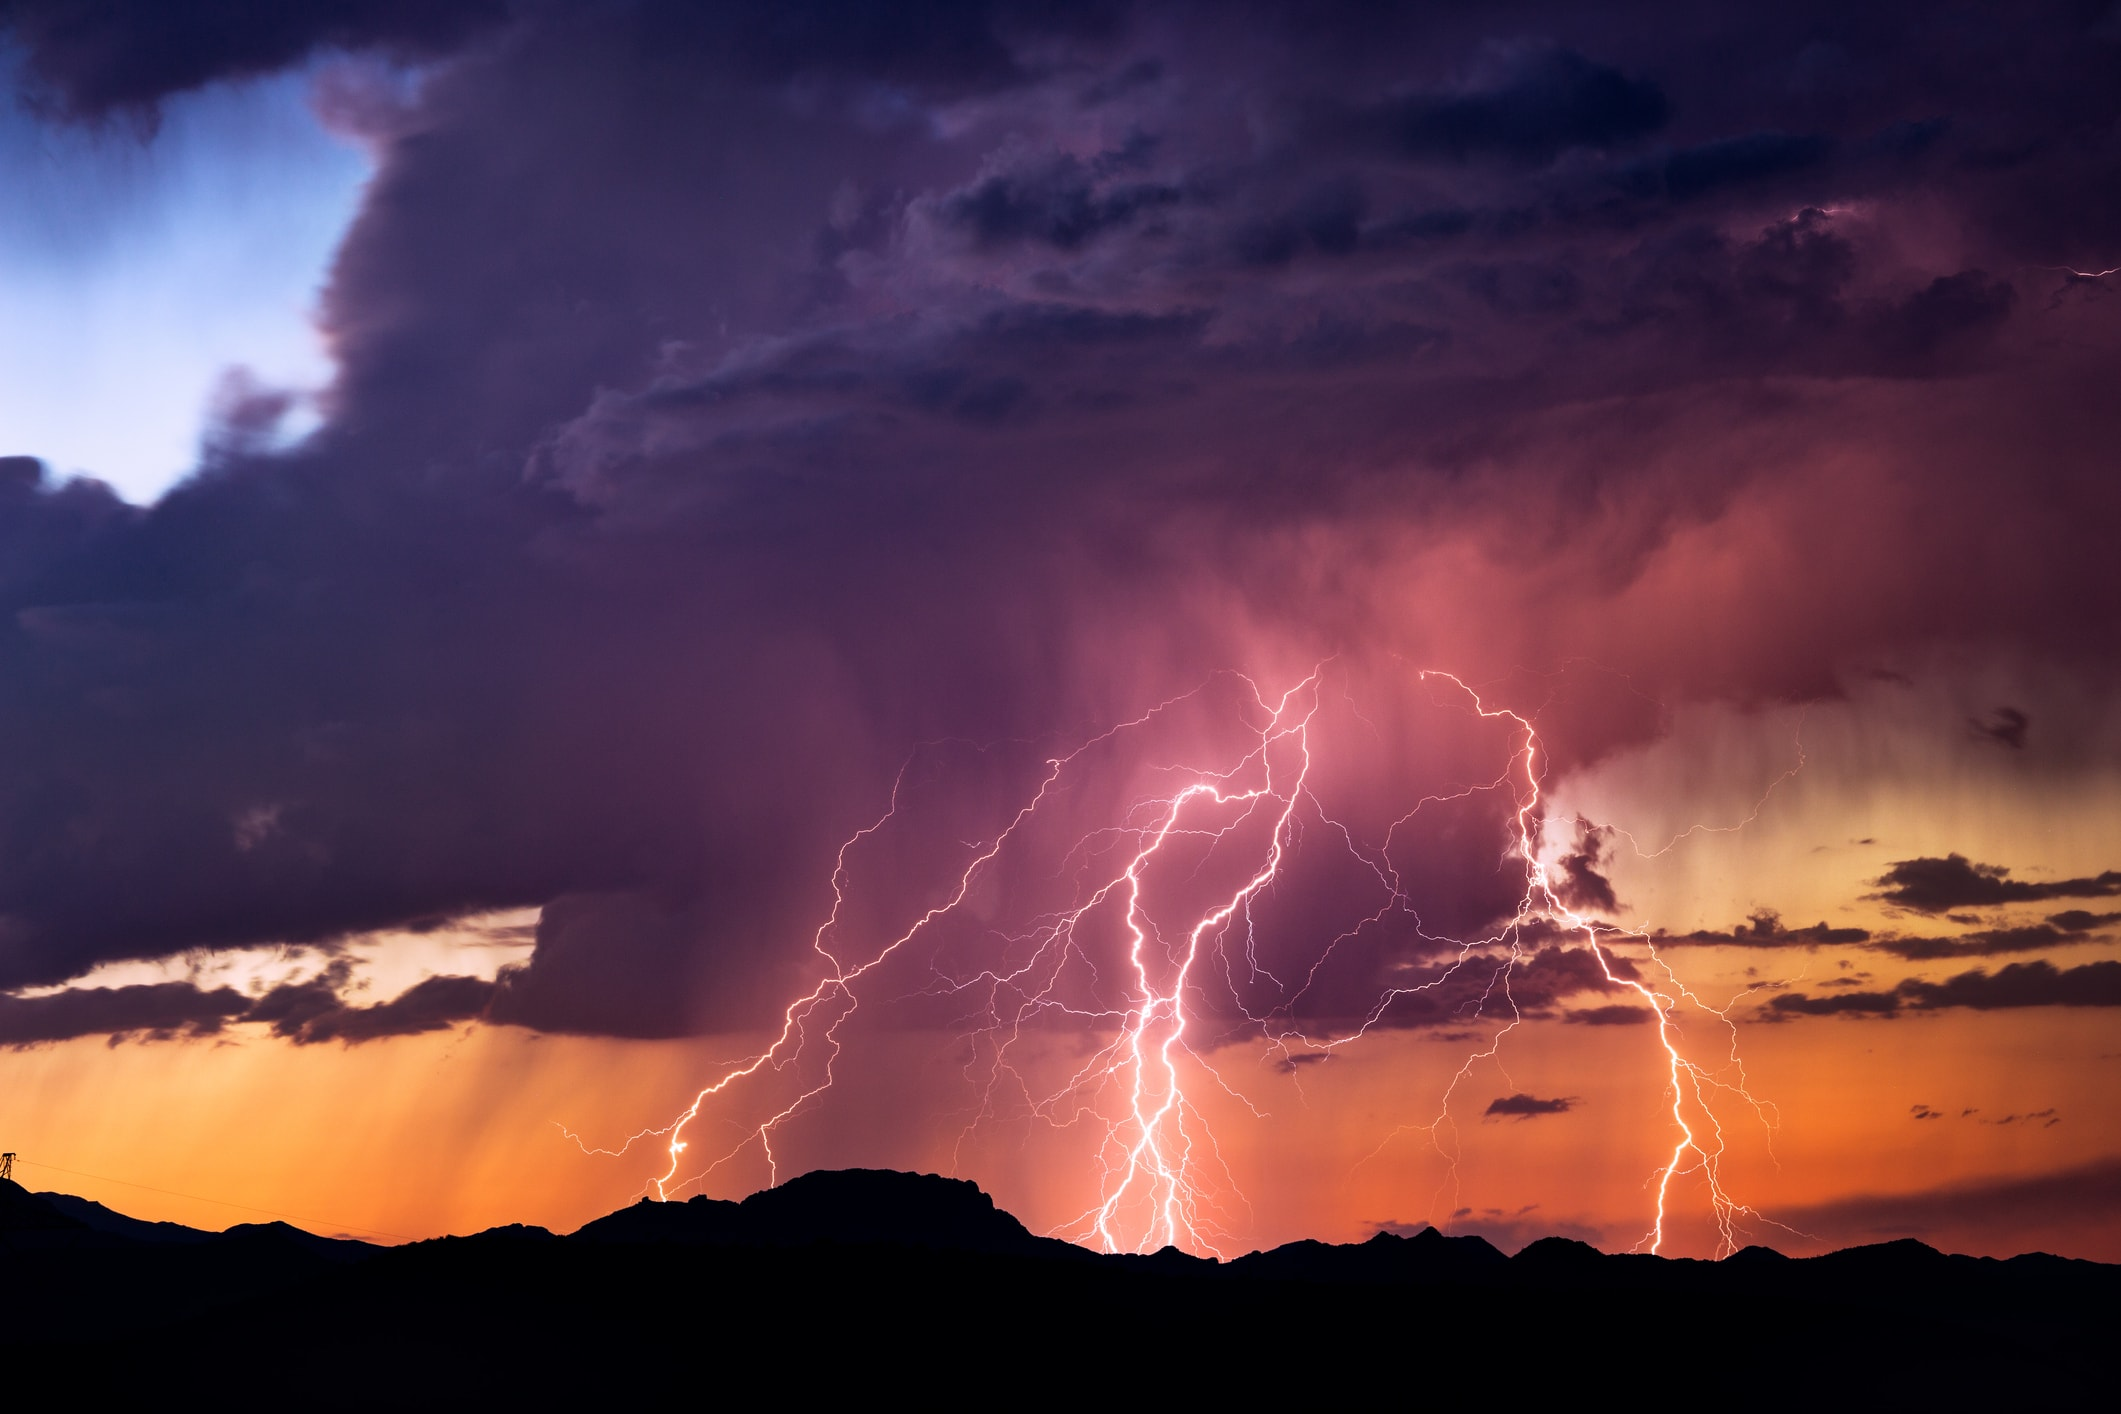 lightning trigger buying guide image